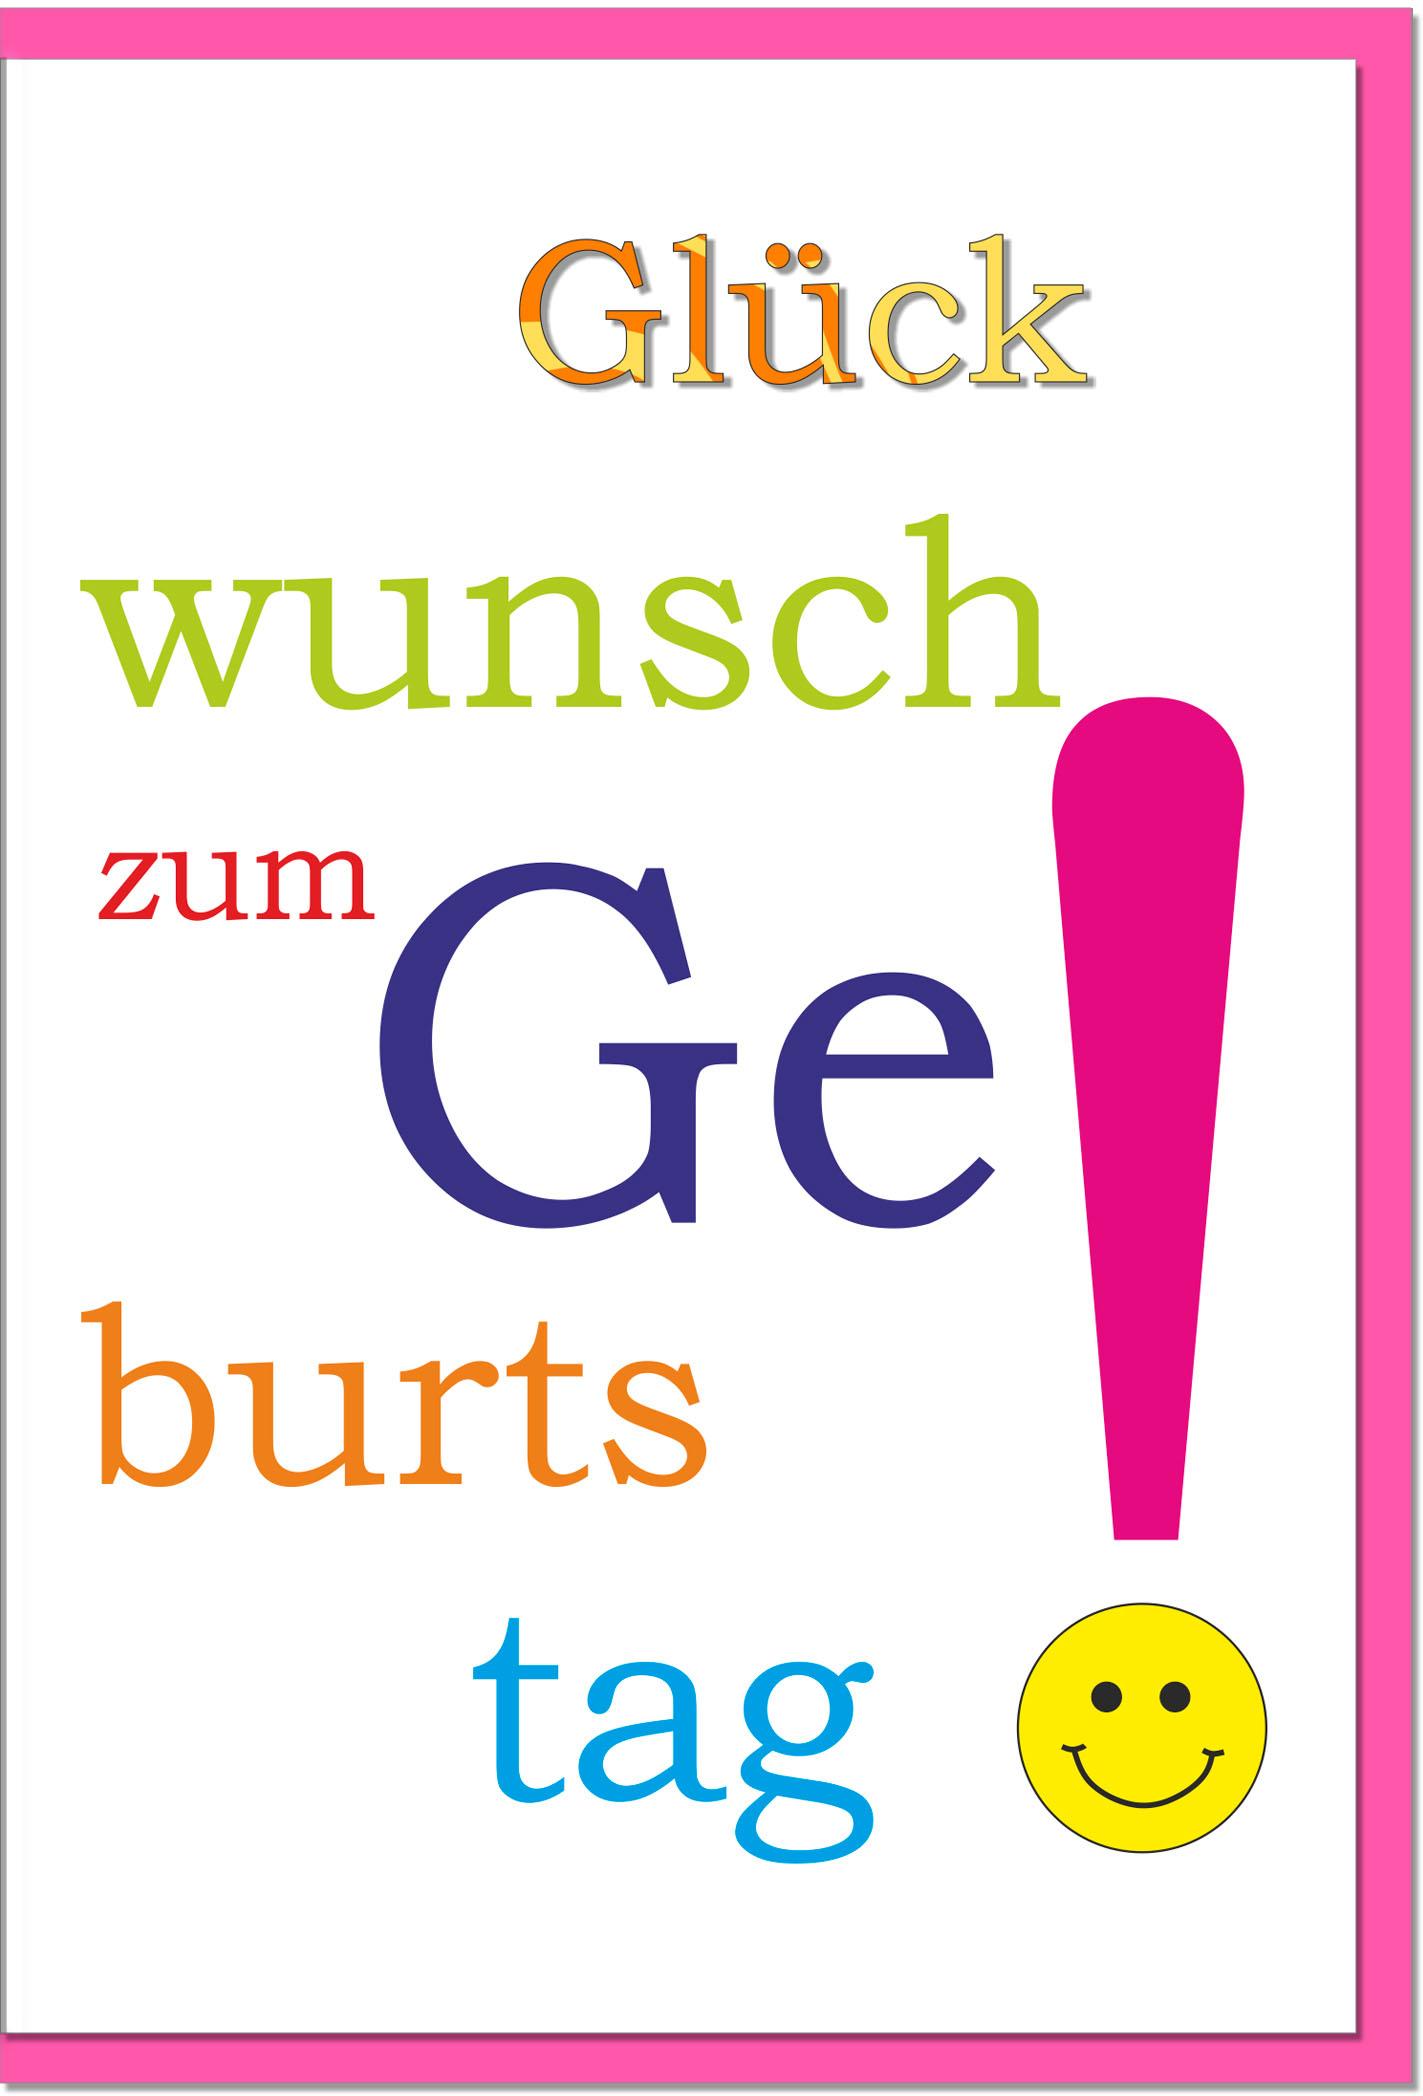 Geburtstagskarten / Grußkarten /Geburtstag Bunter Schriftzug